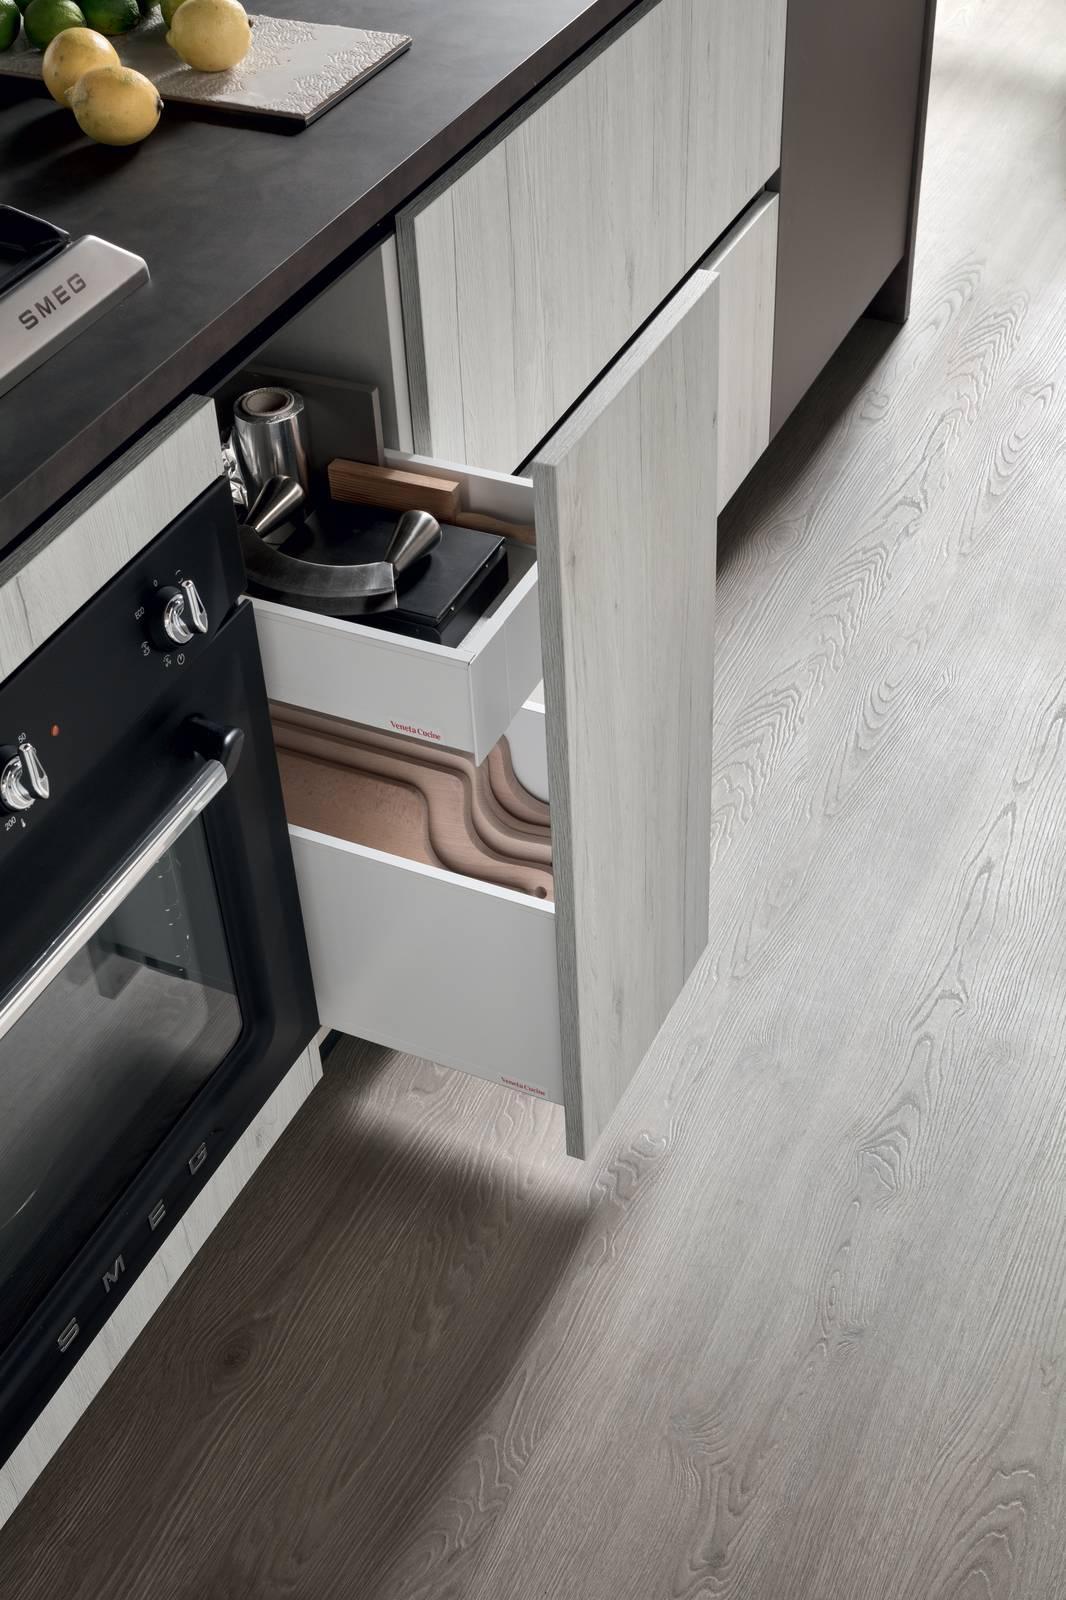 Veneta Cucine Accessori Cassetti.Cassetti Cassettoni Cestoni La Praticita In Cucina Cose